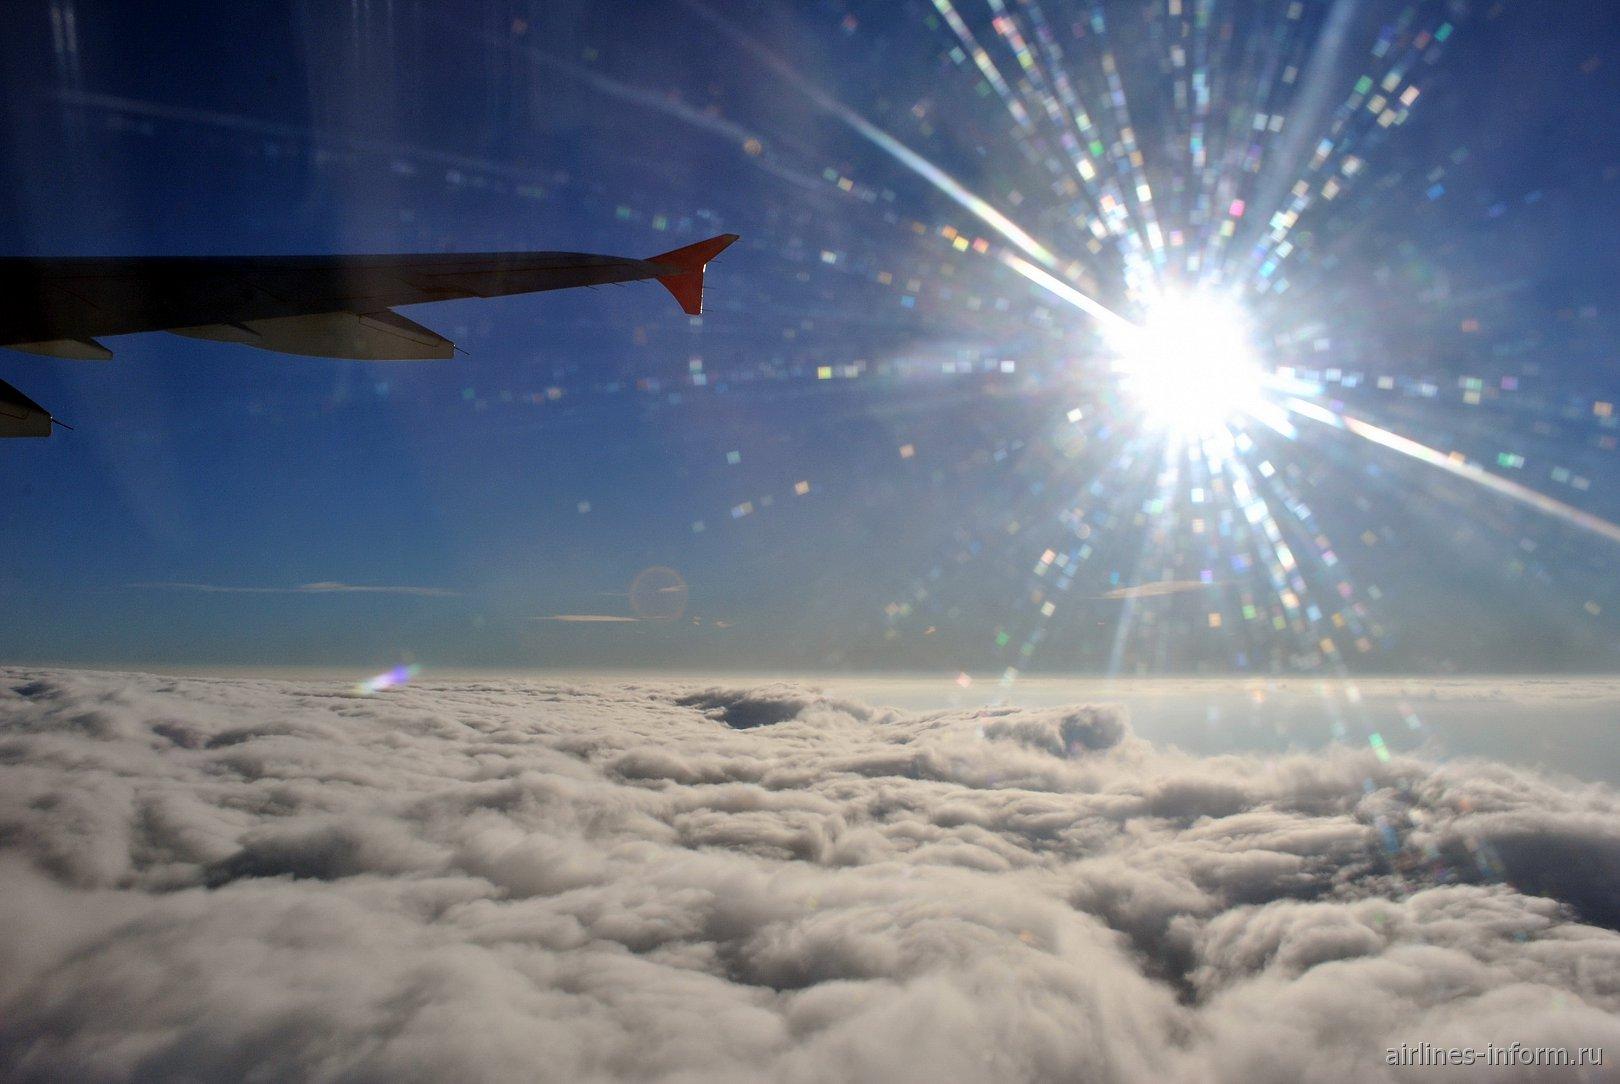 Widen Your World: трансазиатский перелёт с лучшей авиакомпанией Европы. Стамбул Ататюрк (IST) - Москва (VKO) на Airbus A321 Turkish Airlines